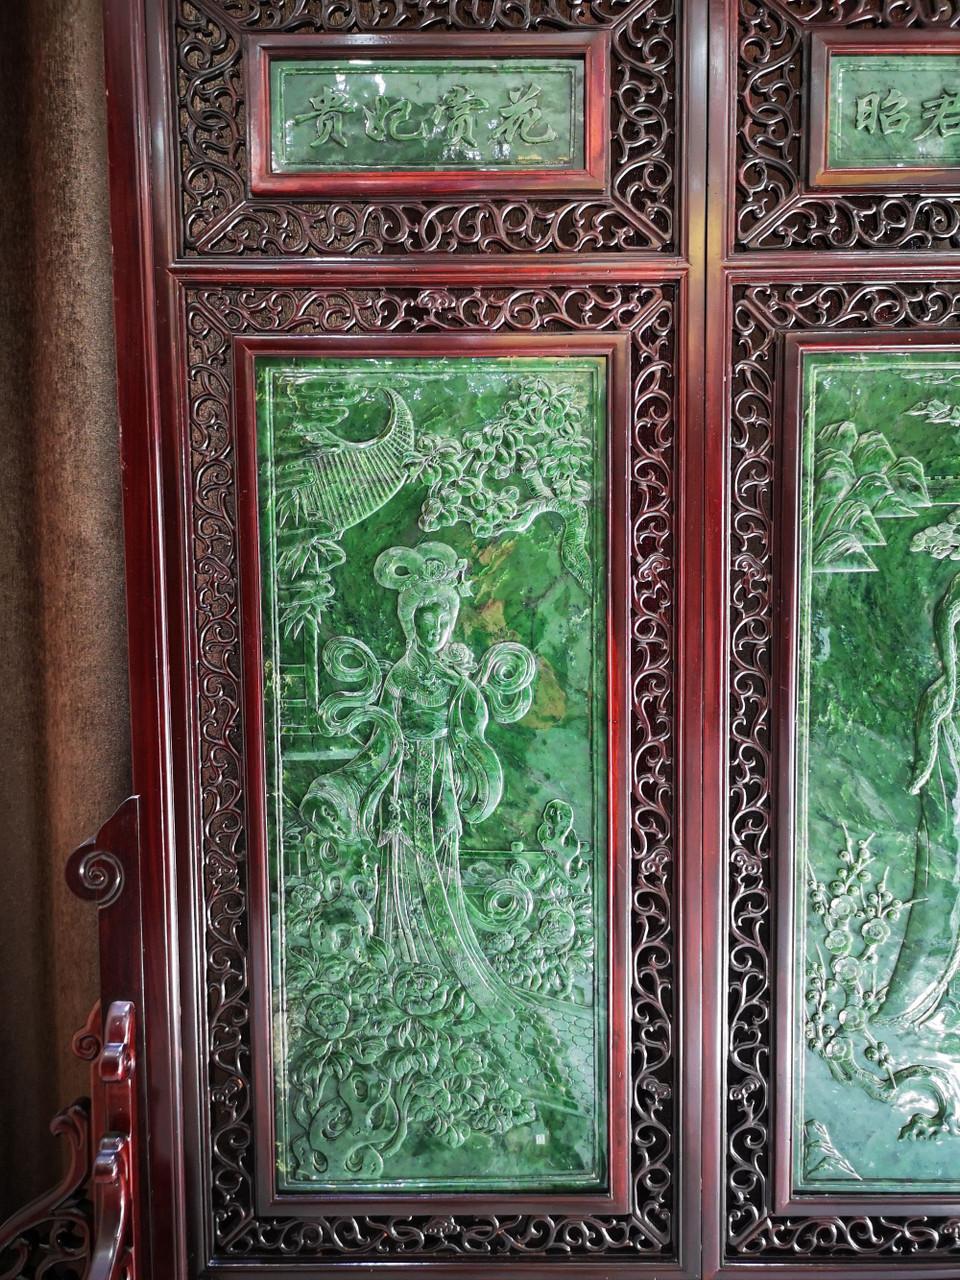 3.30m*2.26m Spinach Jade Rosewood Chinese Screen: Four Great Beauties 手工雕刻碧玉屏风四大美女